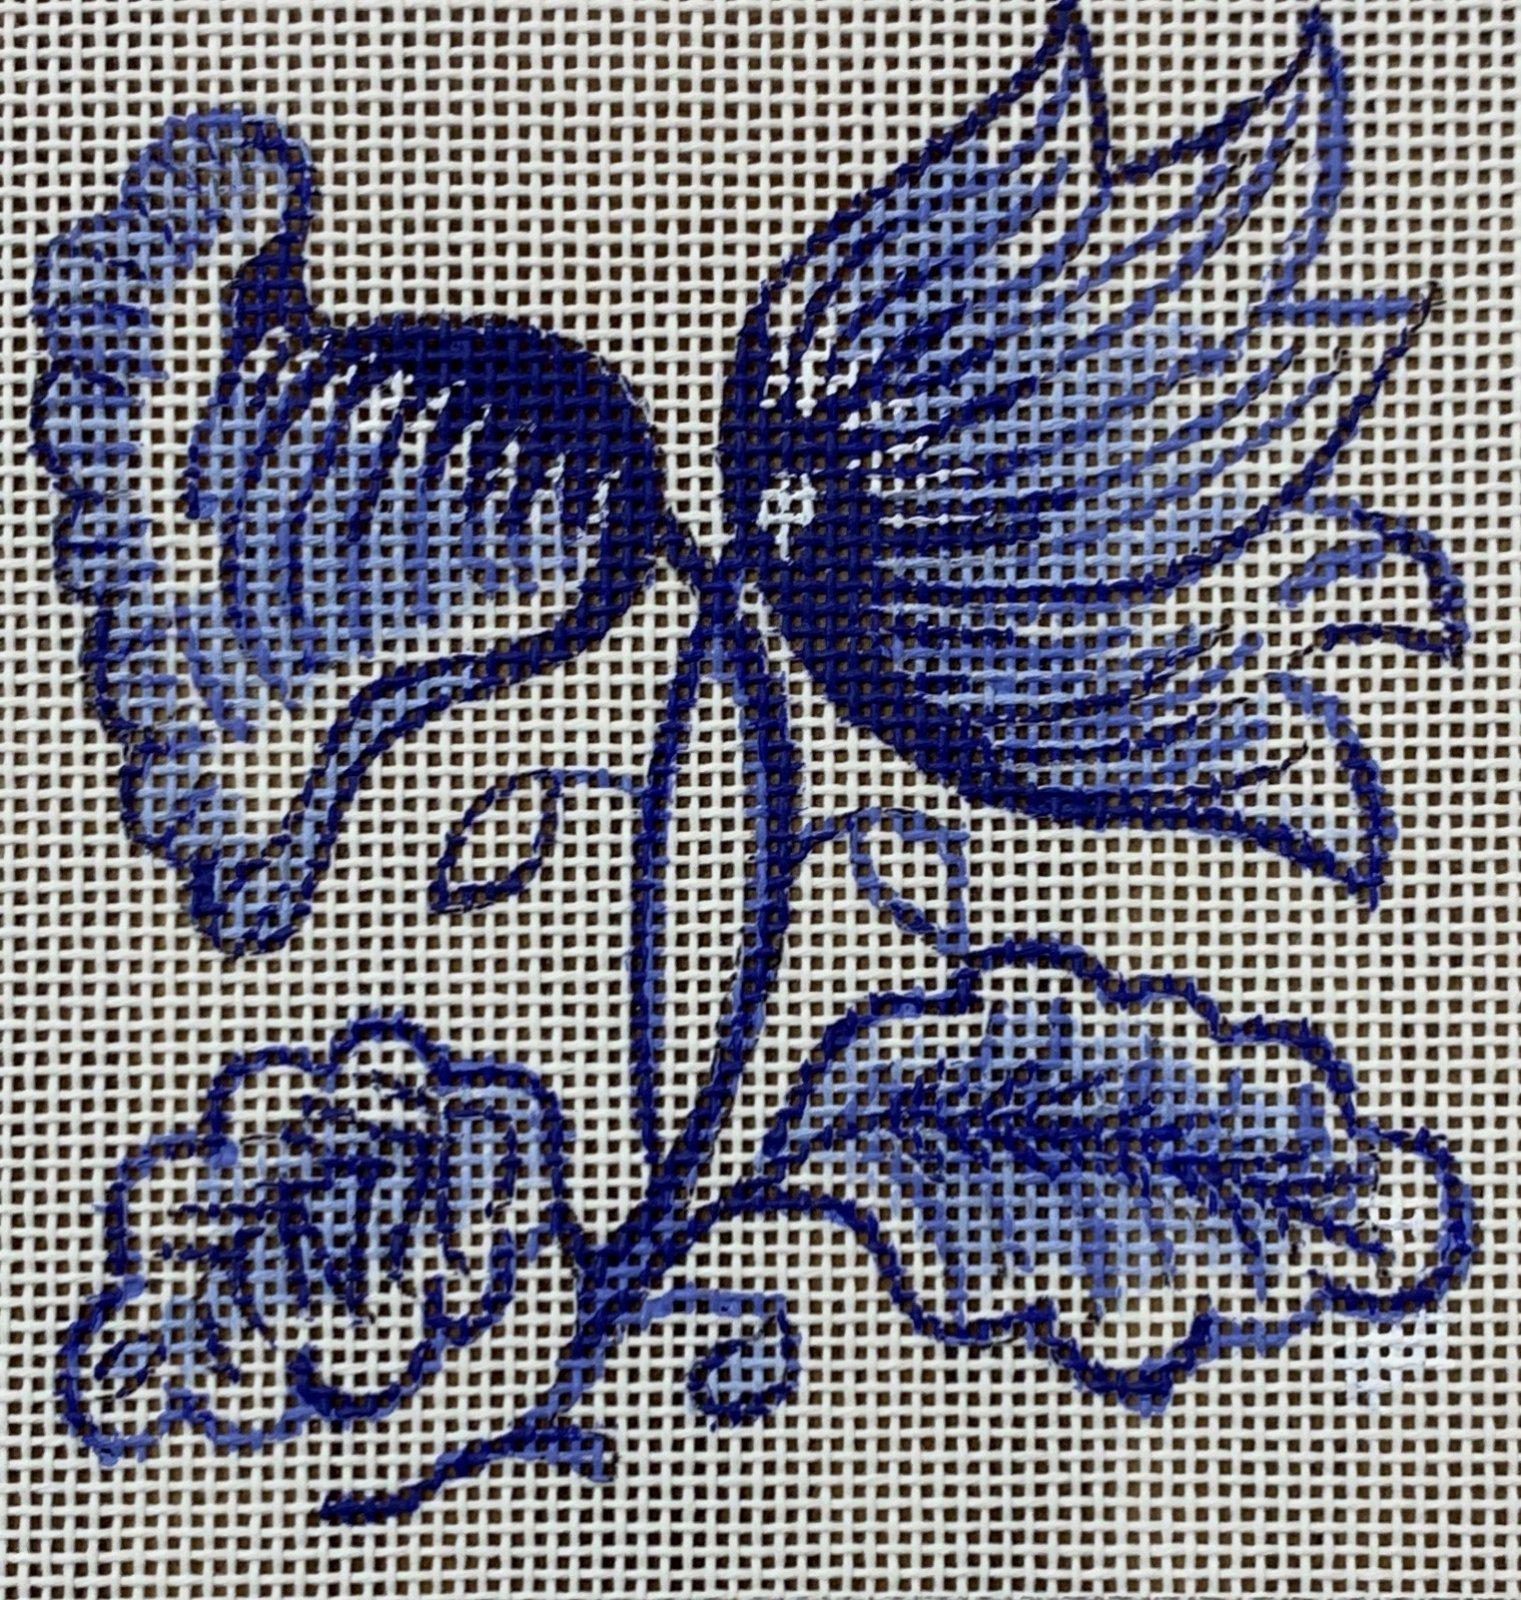 Delft Tiles Collection - Jacobean Bloom